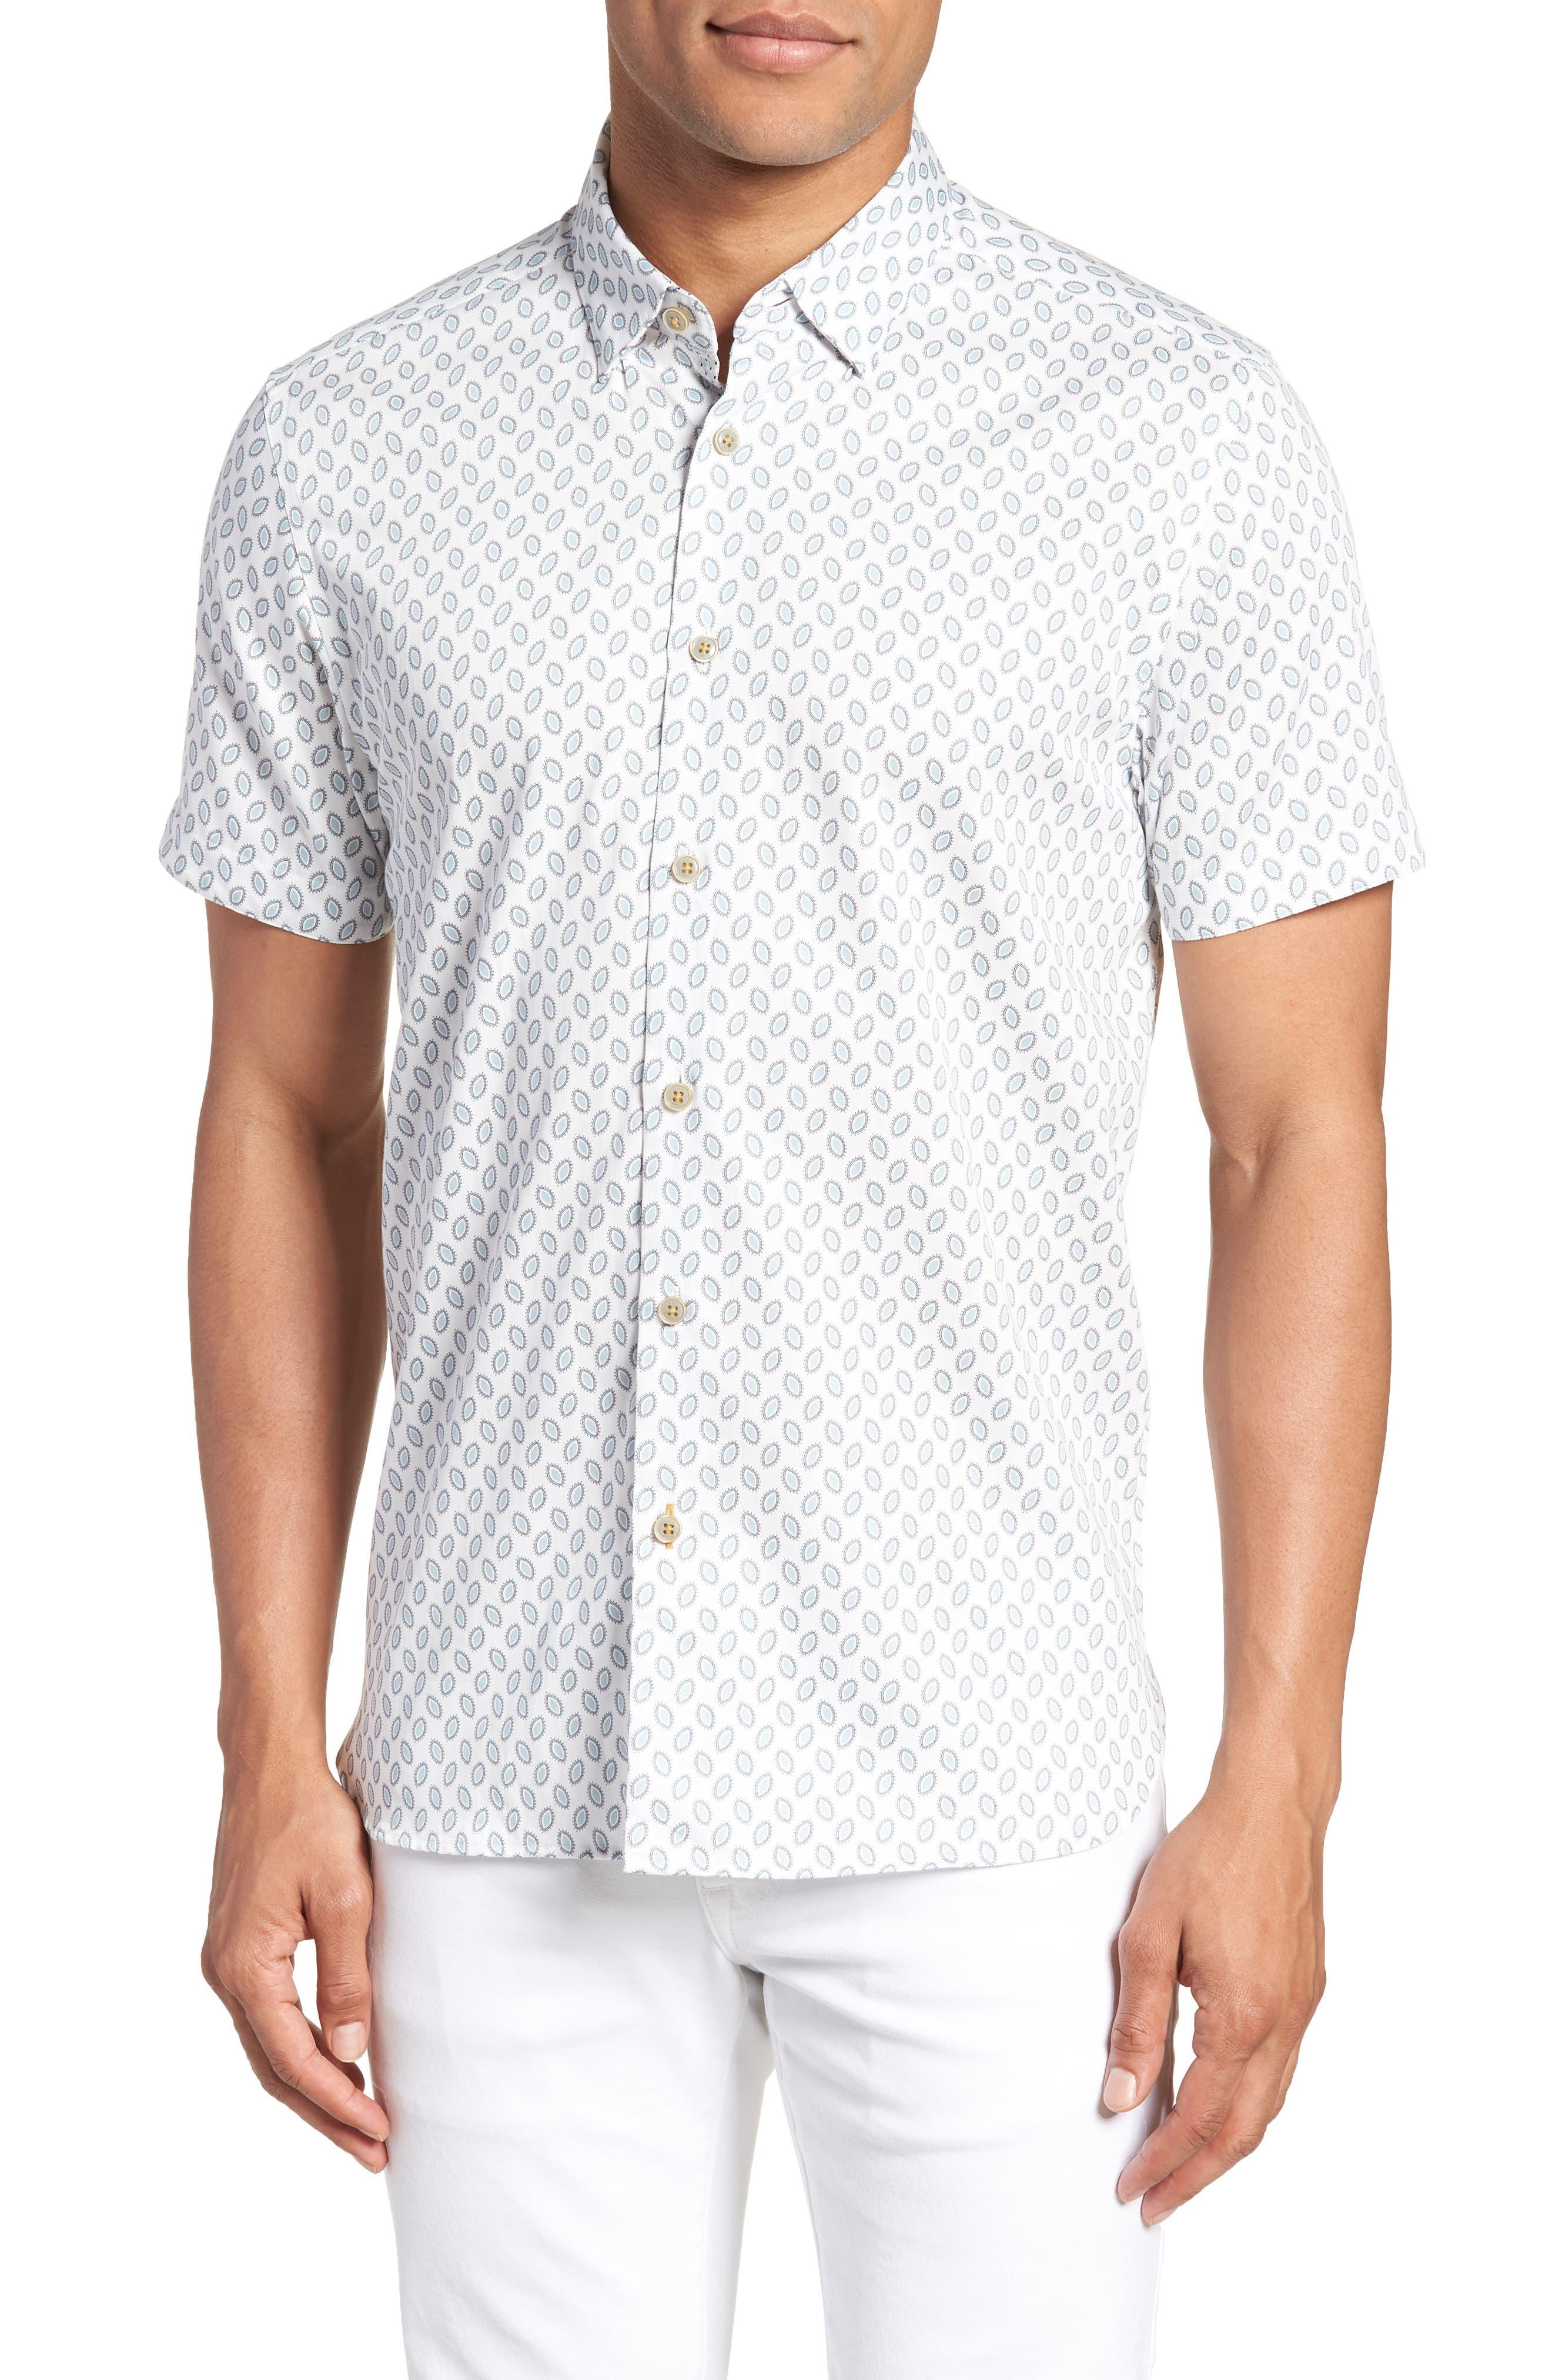 Newfone Trim Fit Chambray Sport Shirt,                             Main thumbnail 1, color,                             100